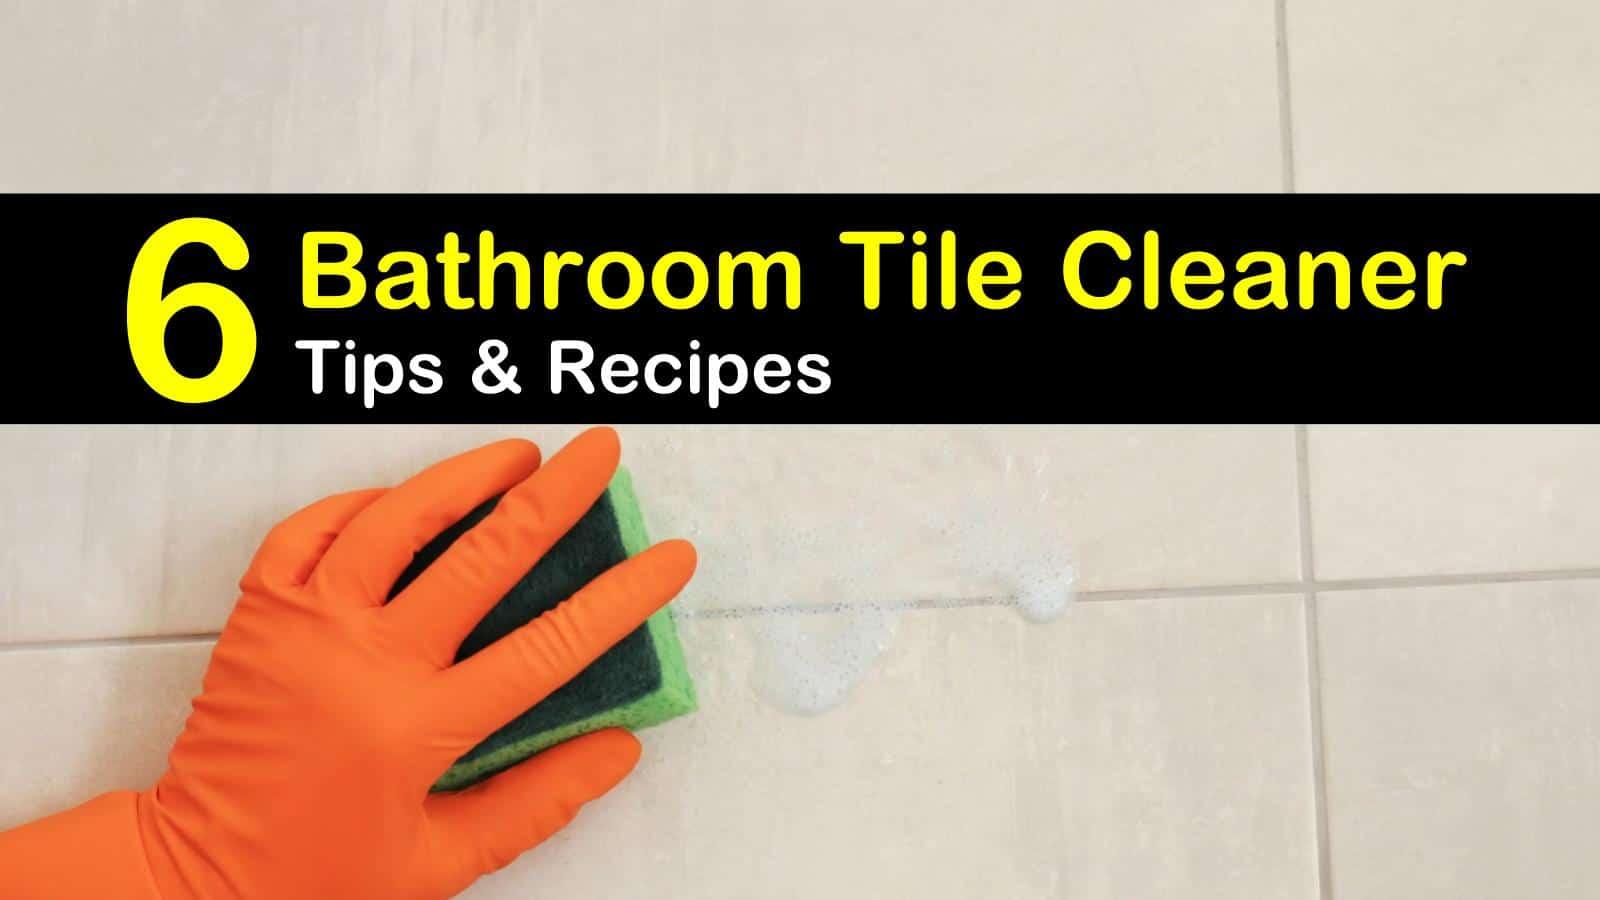 bathroom tile cleaner titleimg1